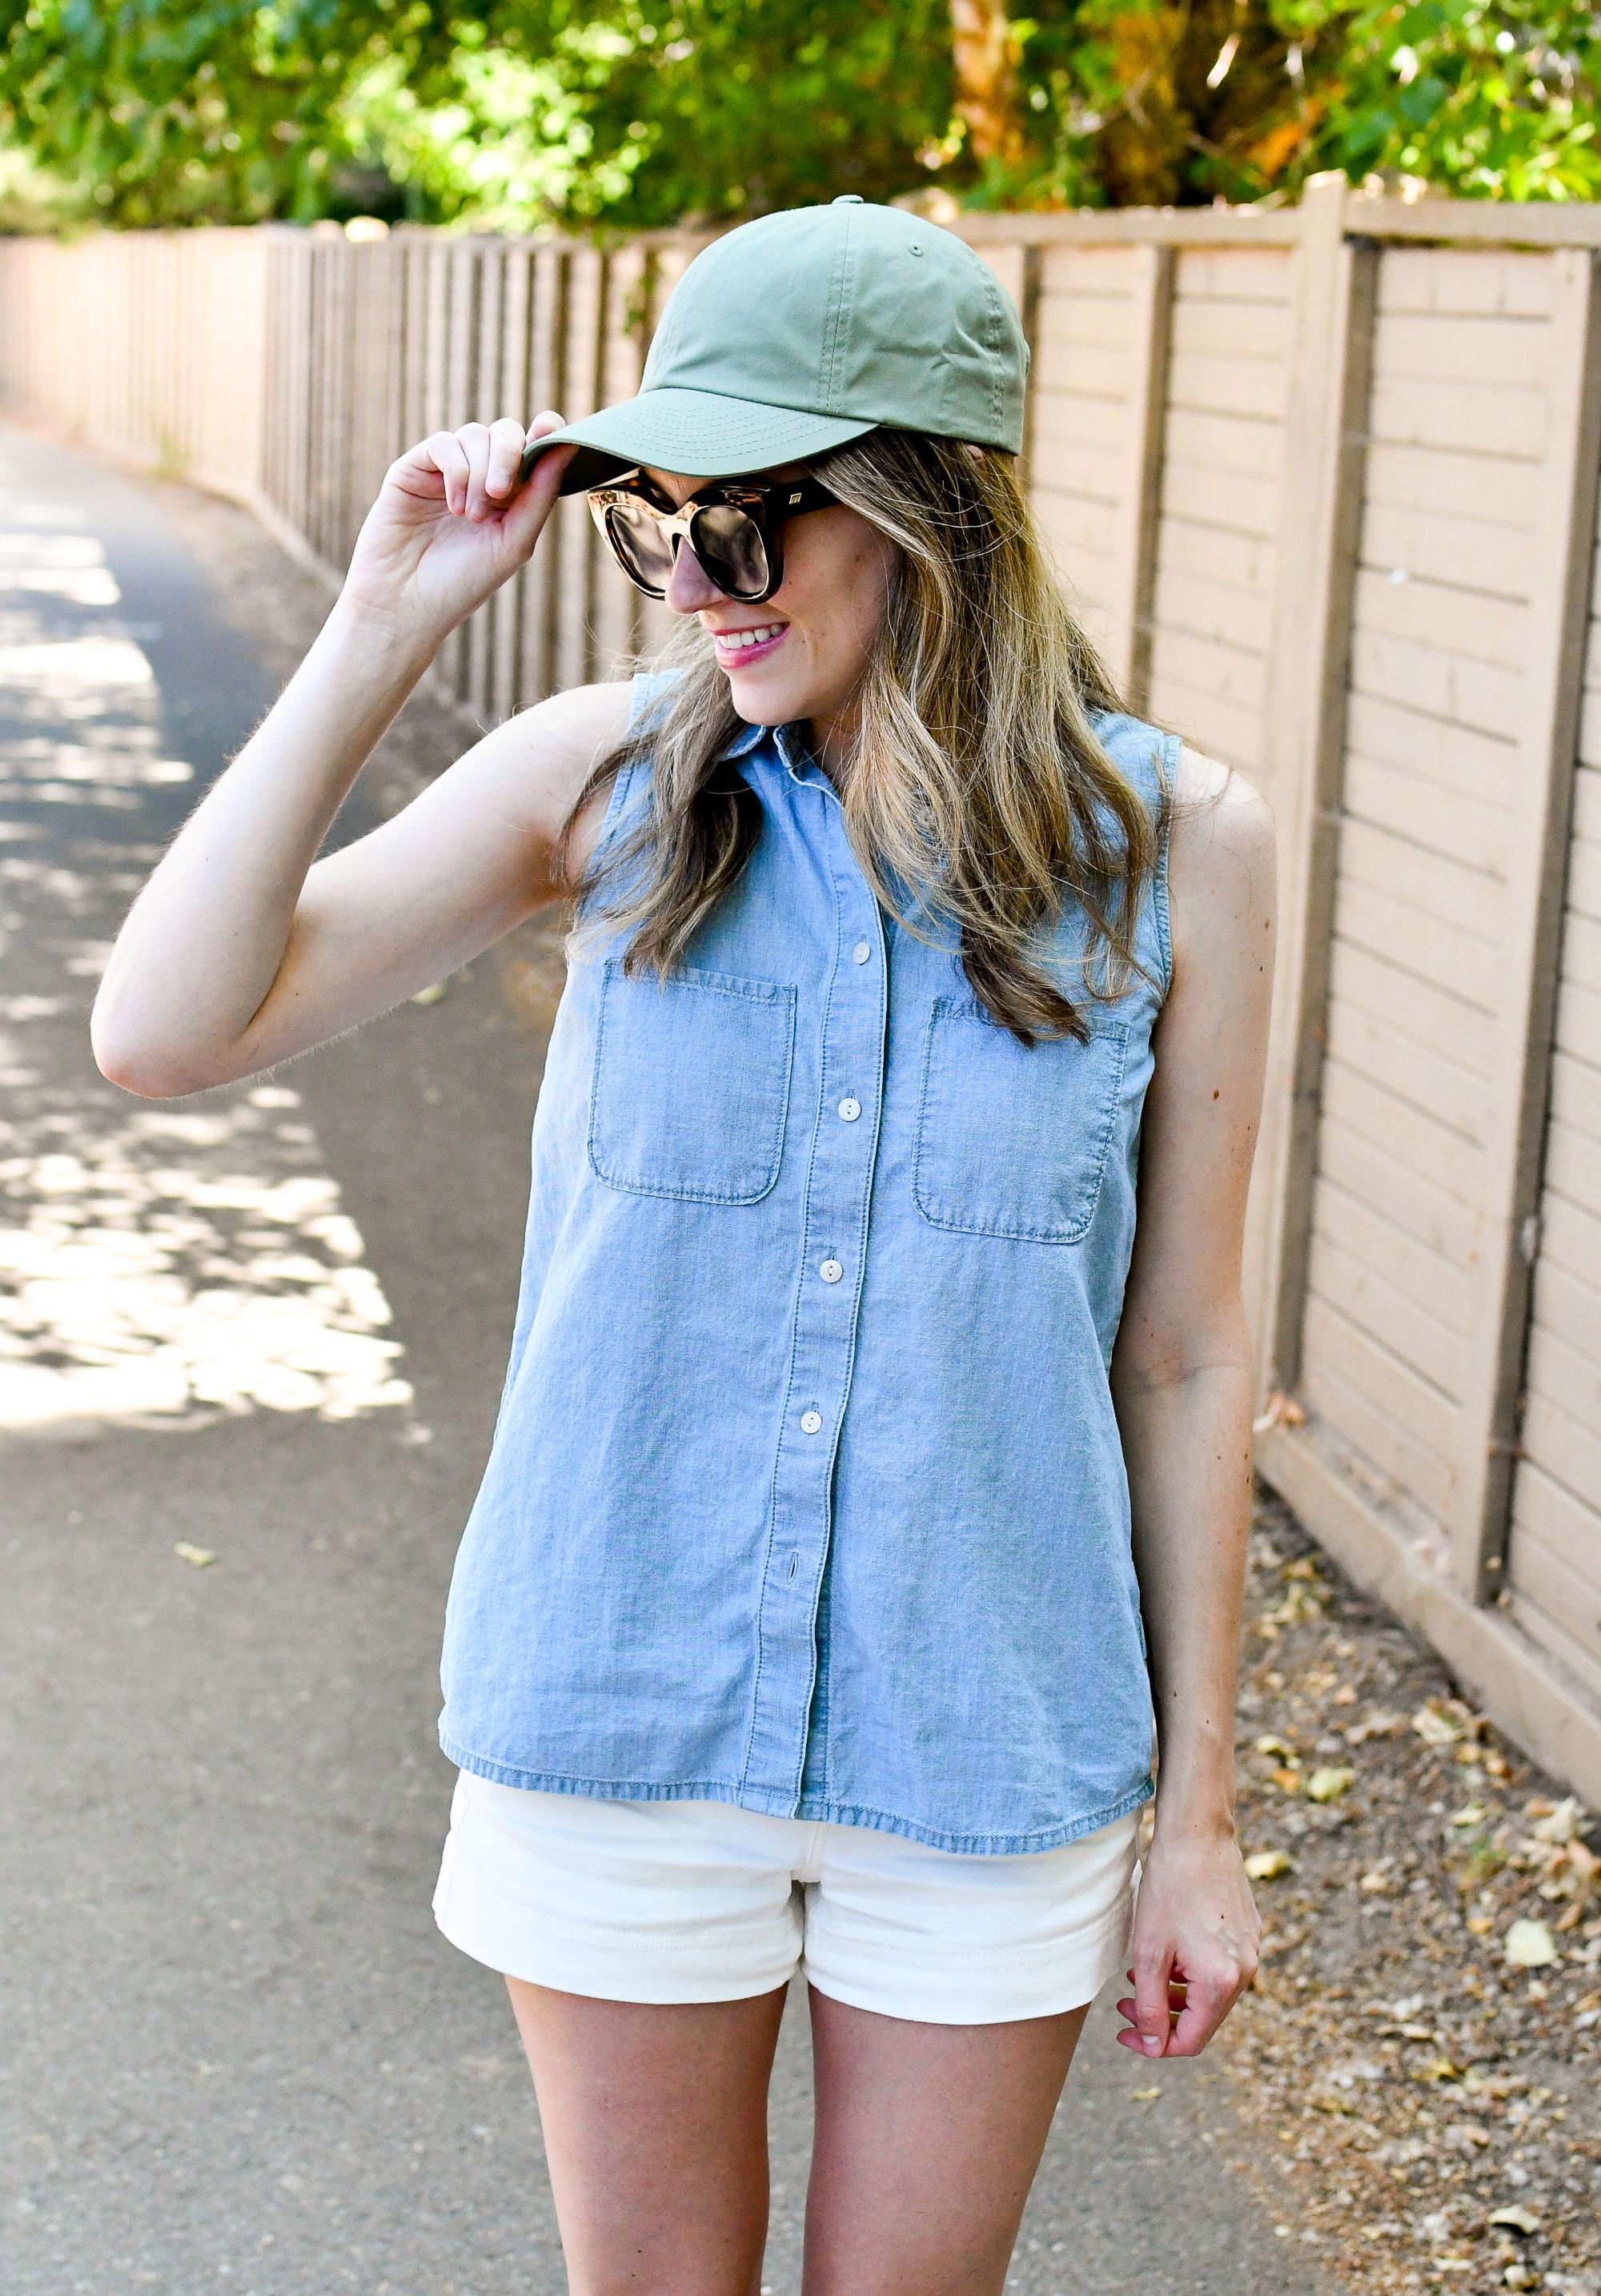 Olive cap + chambray shirt + white shorts — Cotton Cashmere Cat Hair